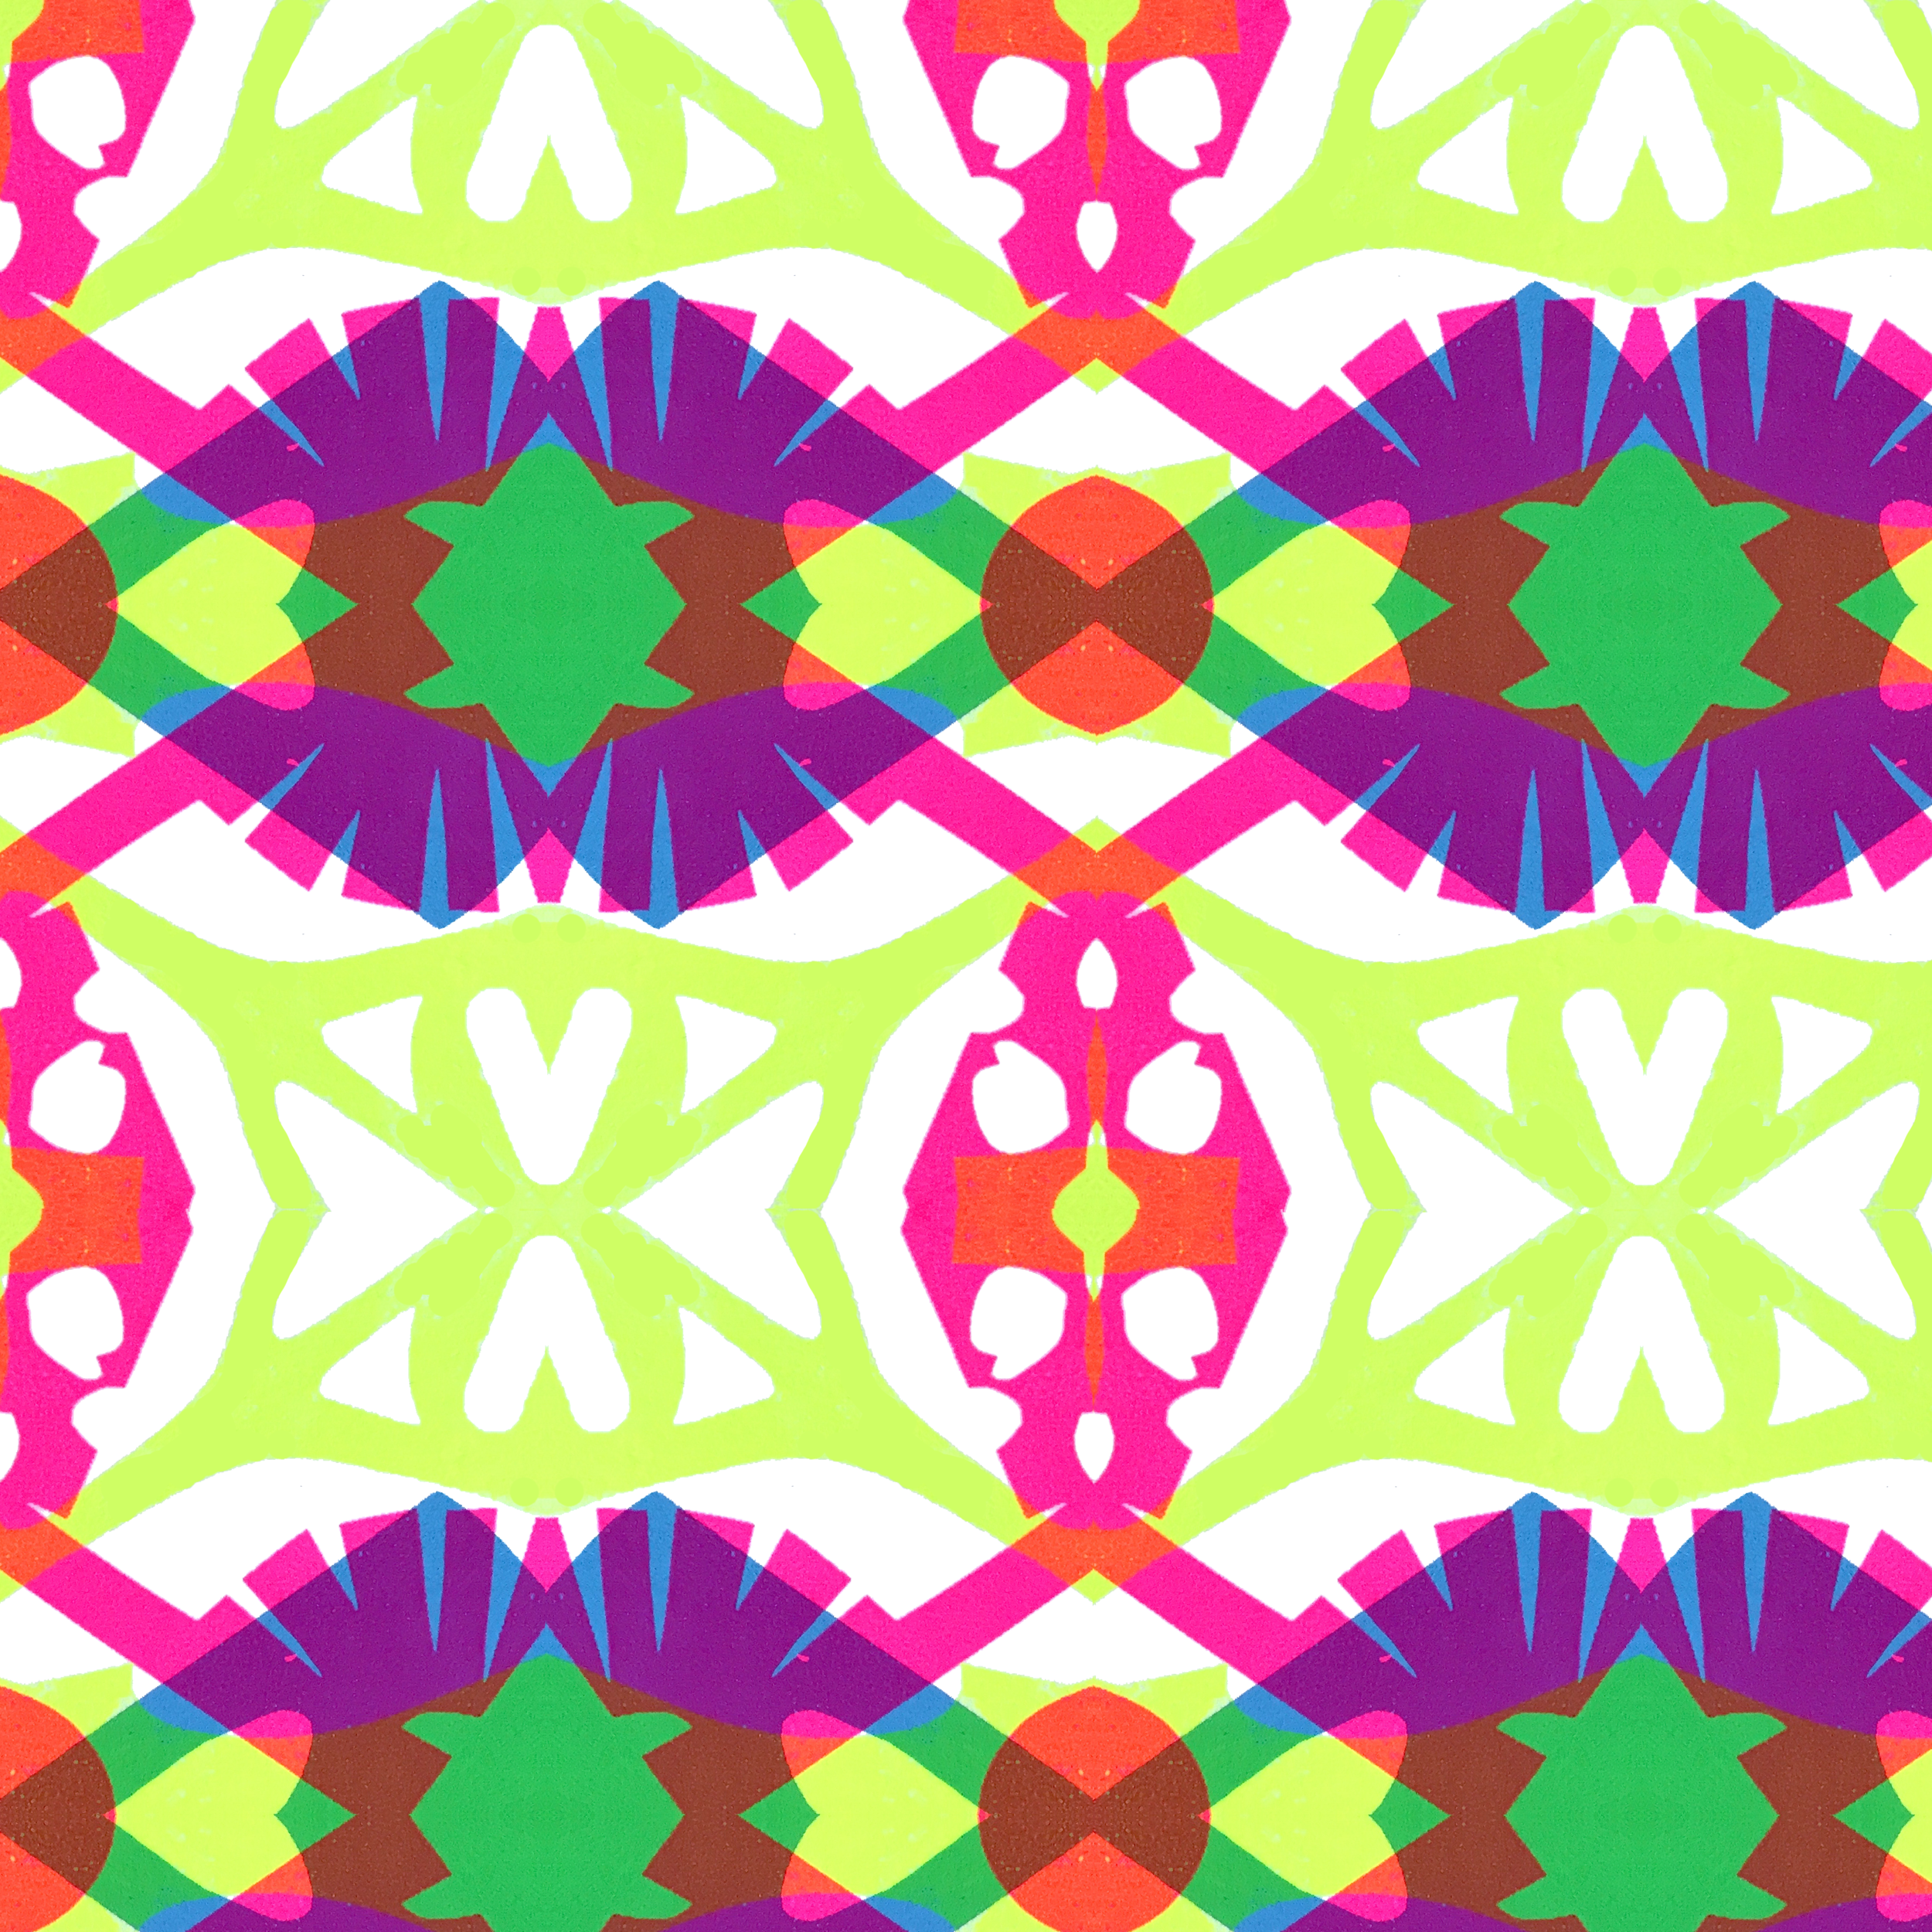 Rainbow Circles_Pattern 6.png